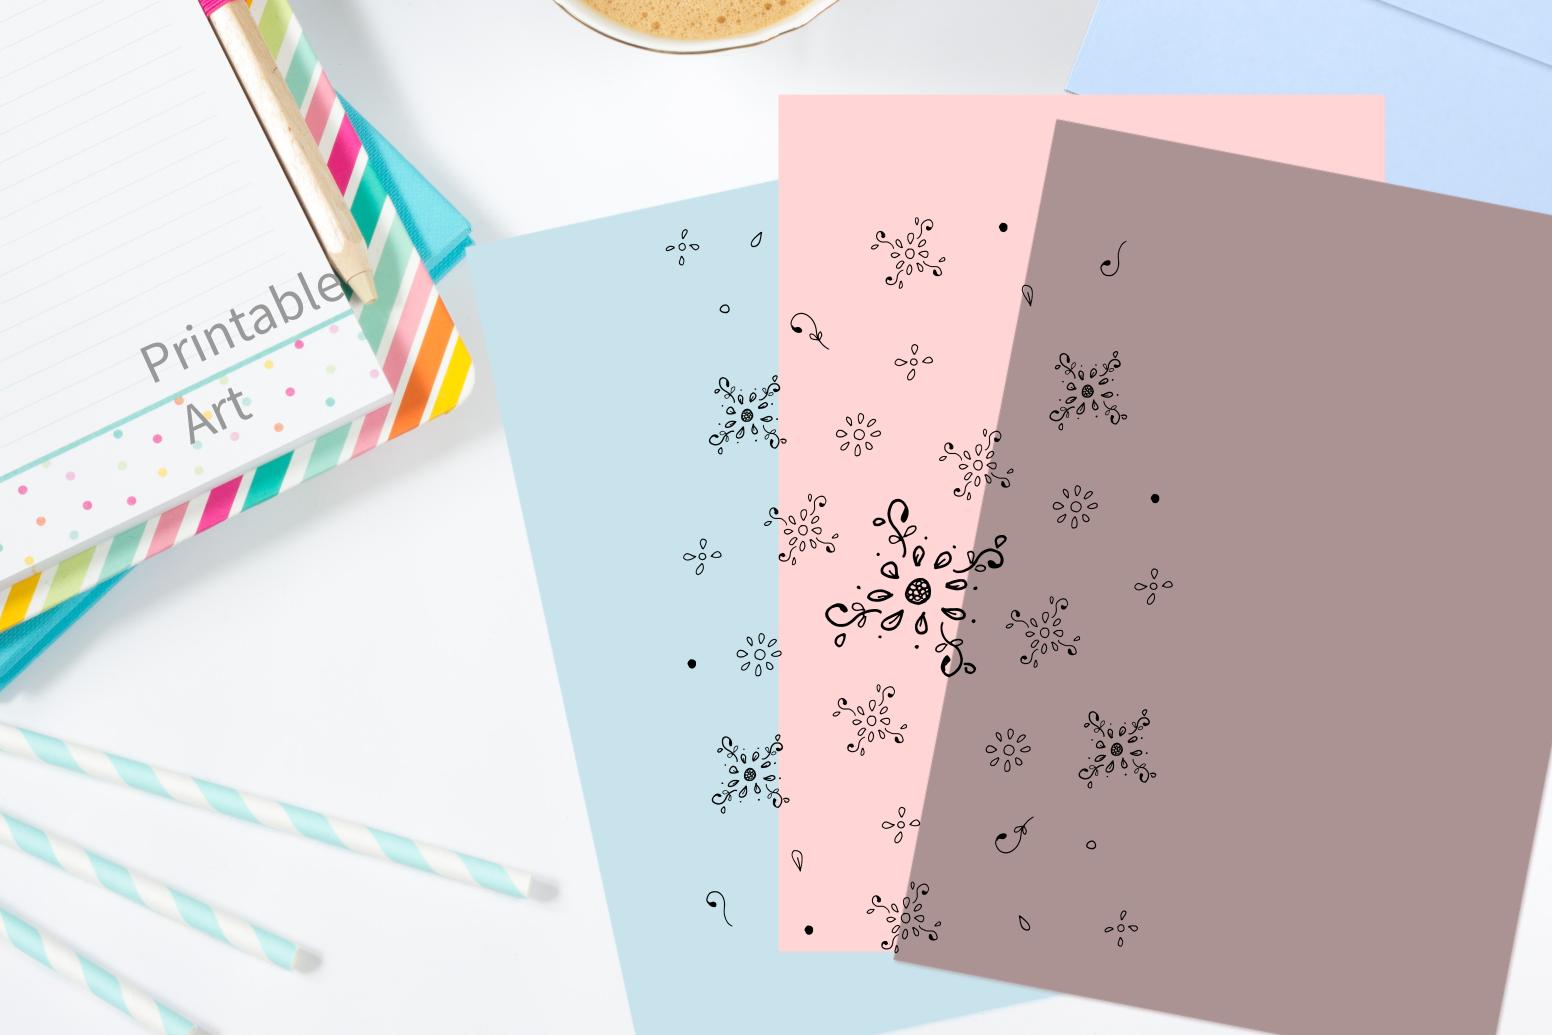 Floral Doodle Ink Pattern, A1, SVG example image 5